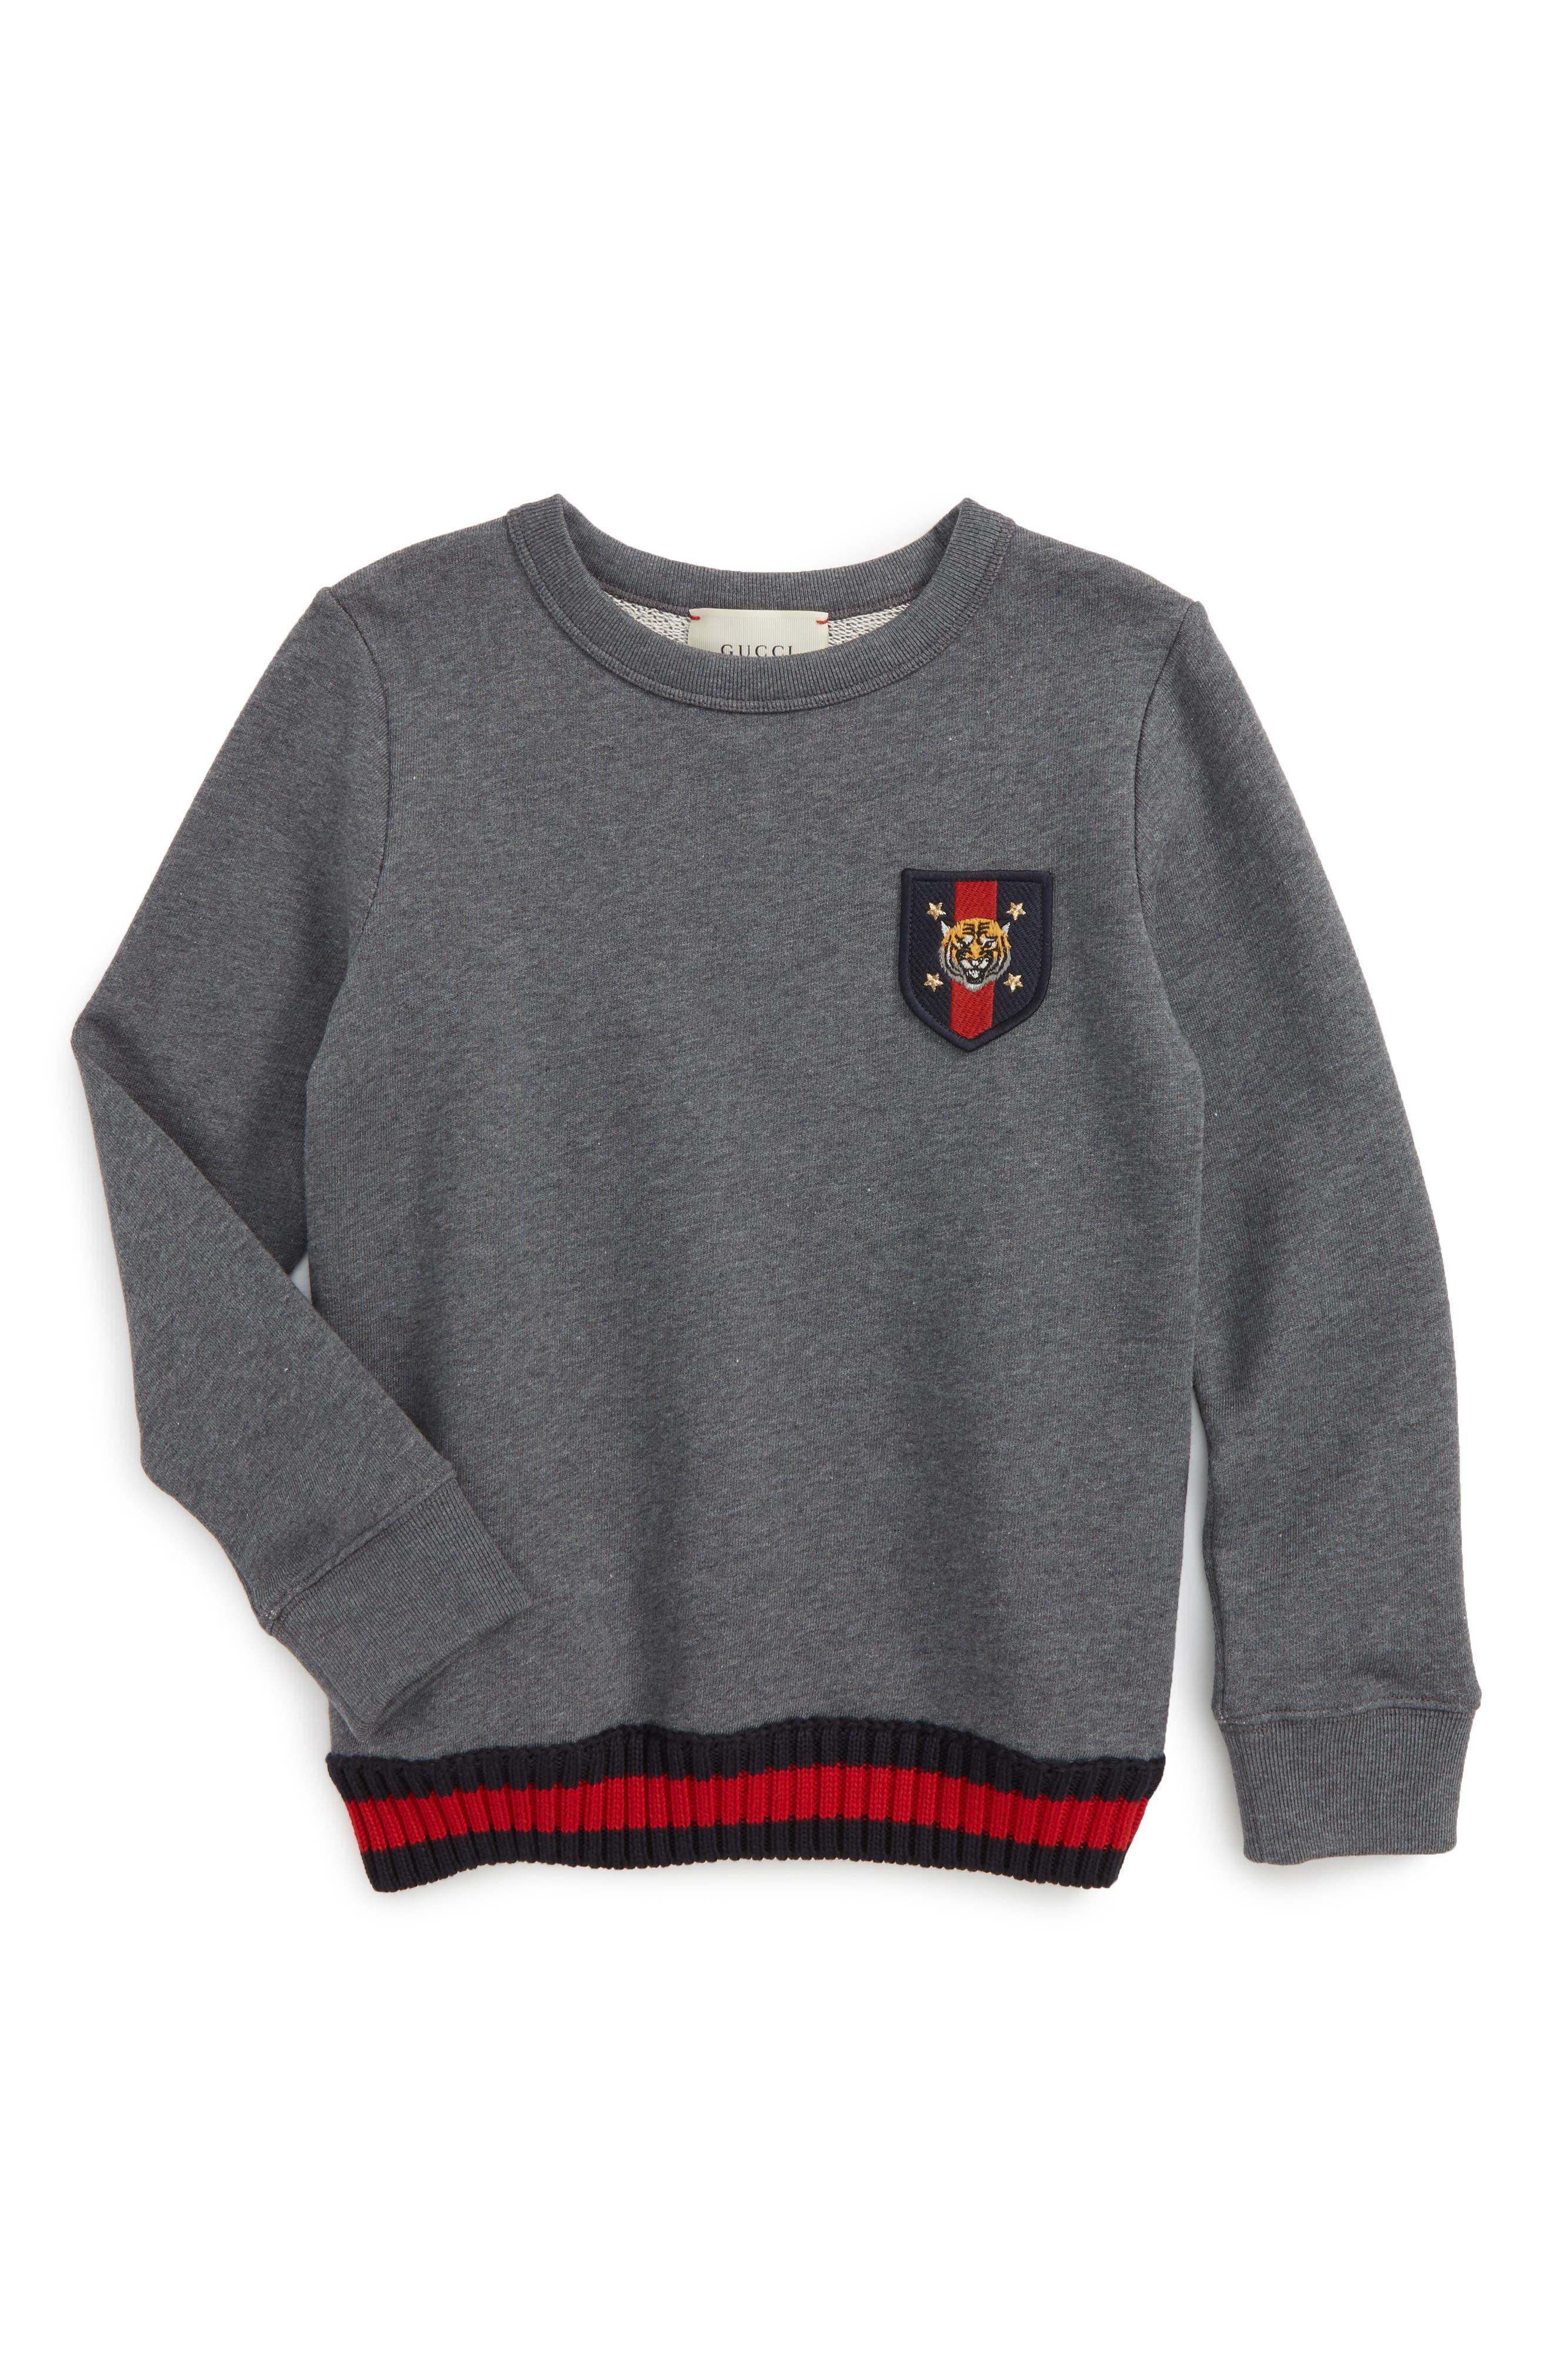 Patch Sweatshirt,                             Main thumbnail 1, color,                             027